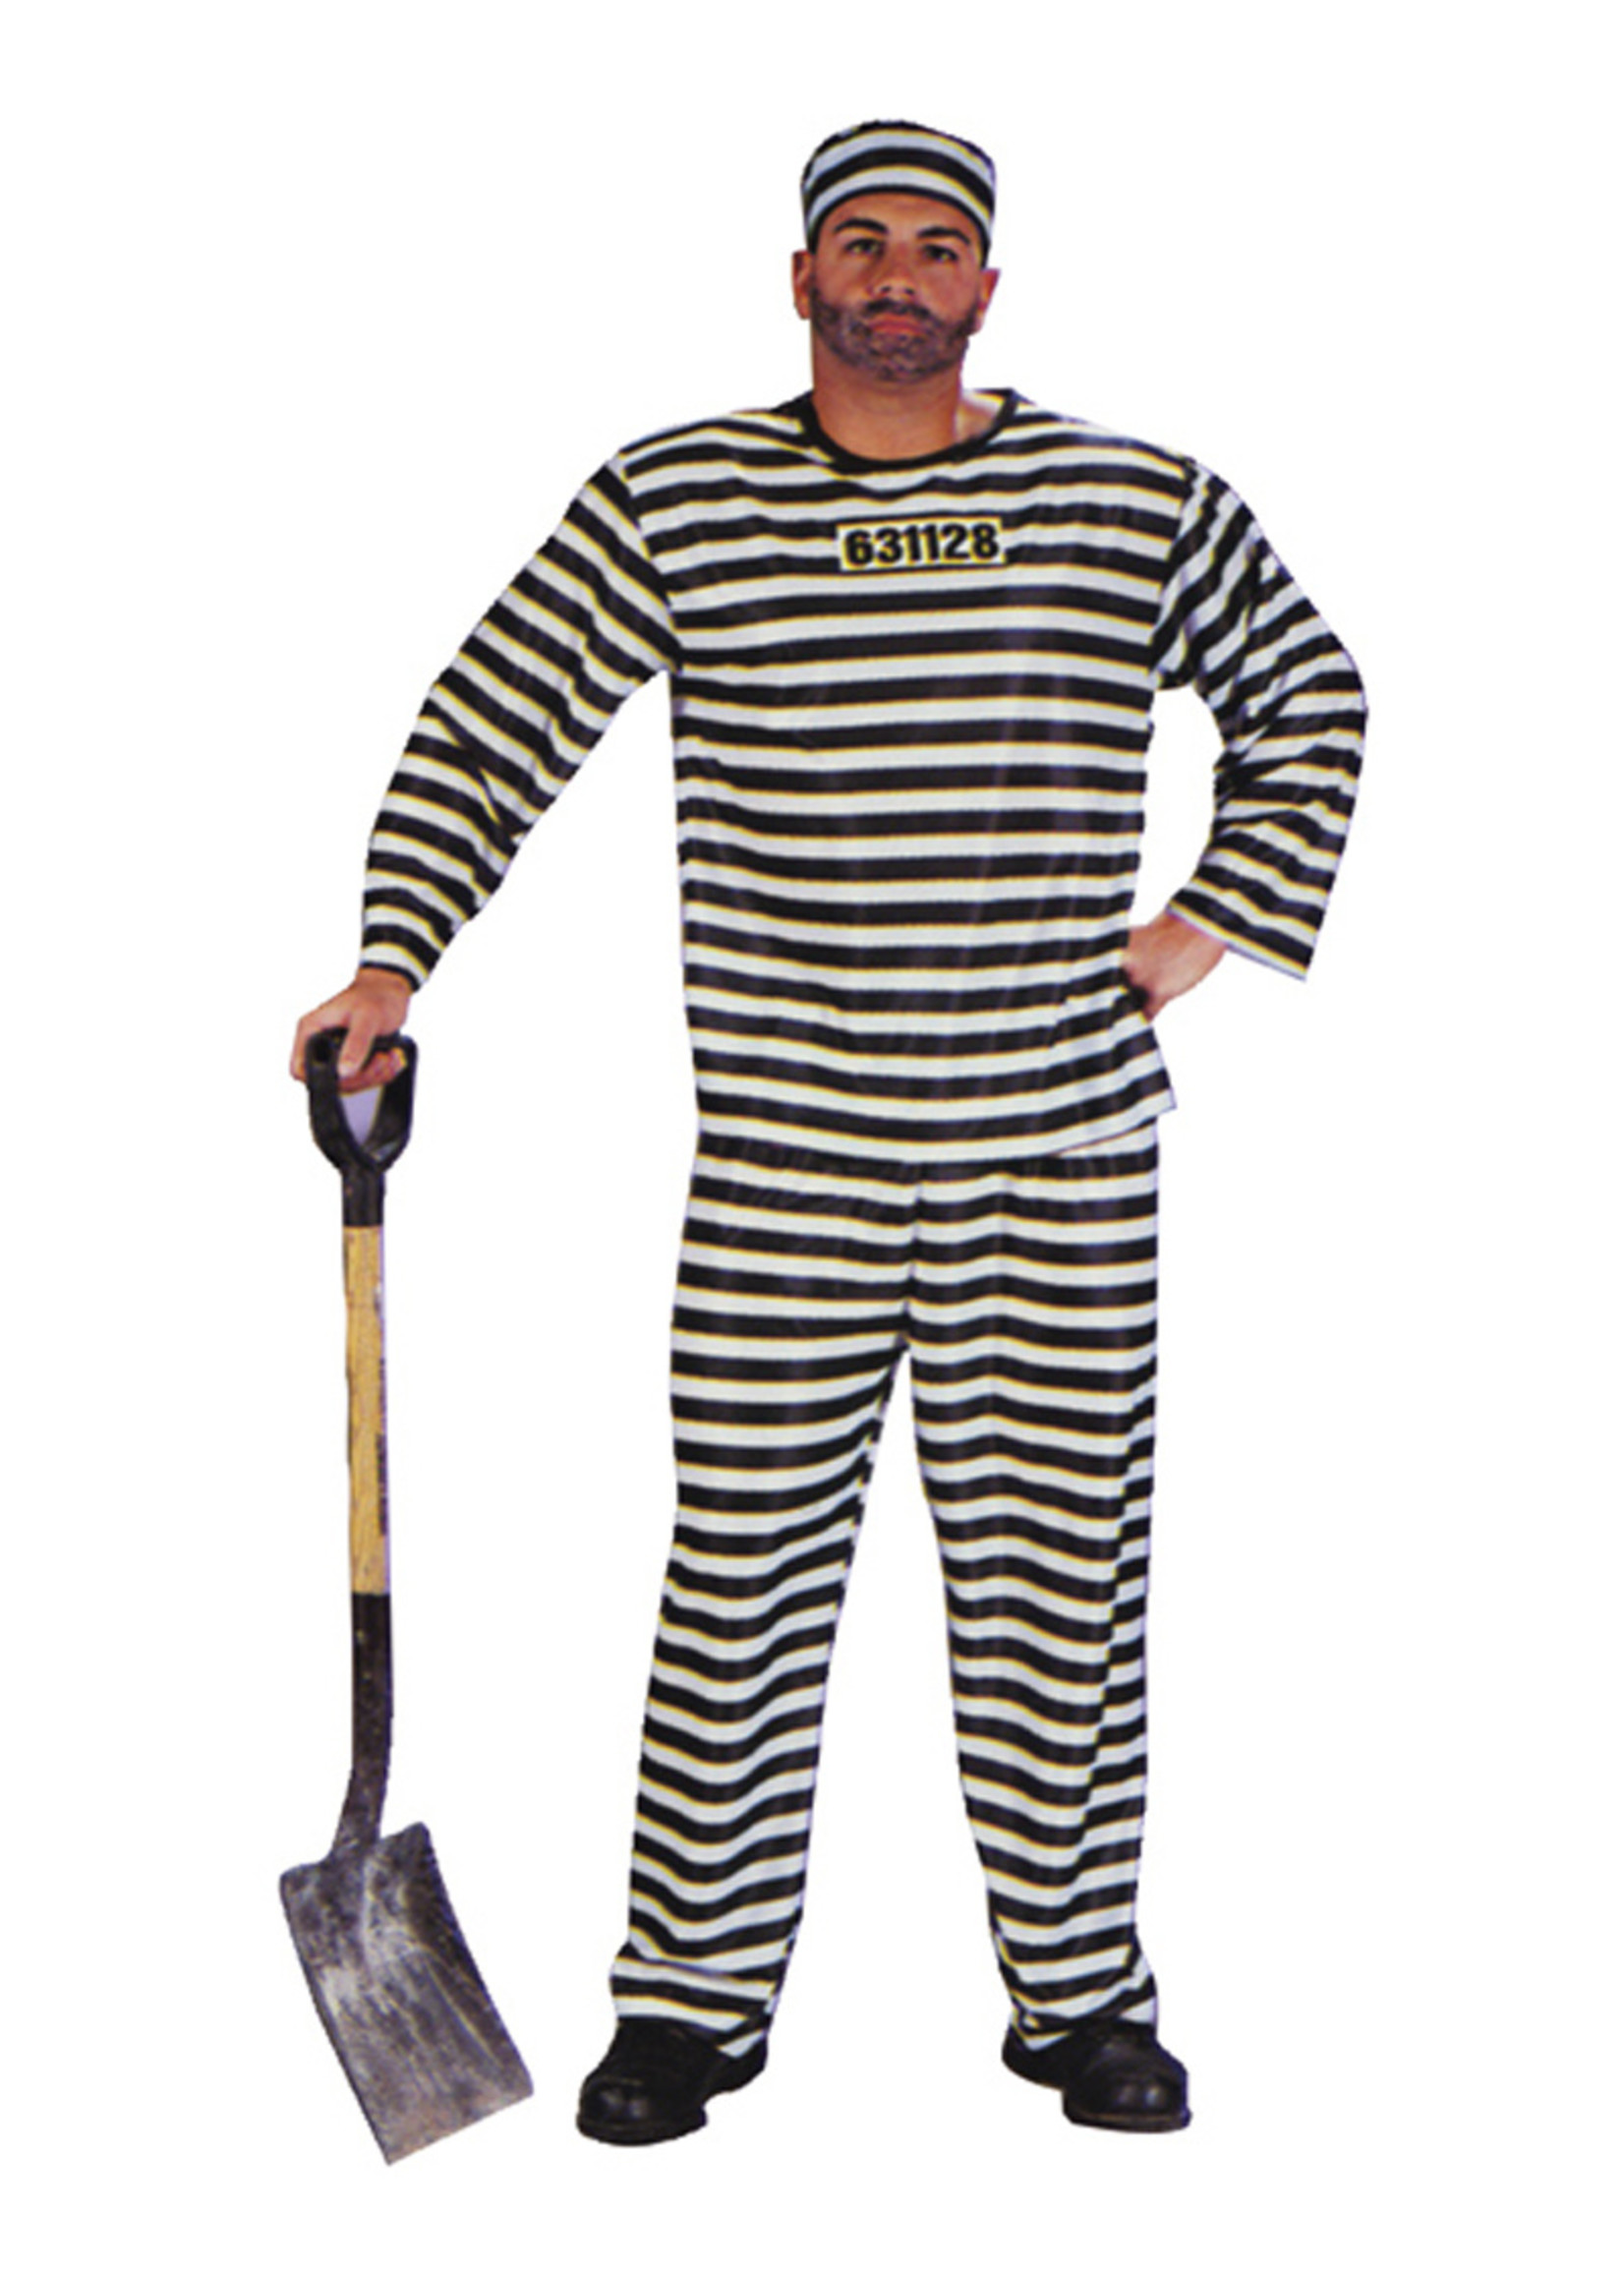 Jailbird Costume - Men's